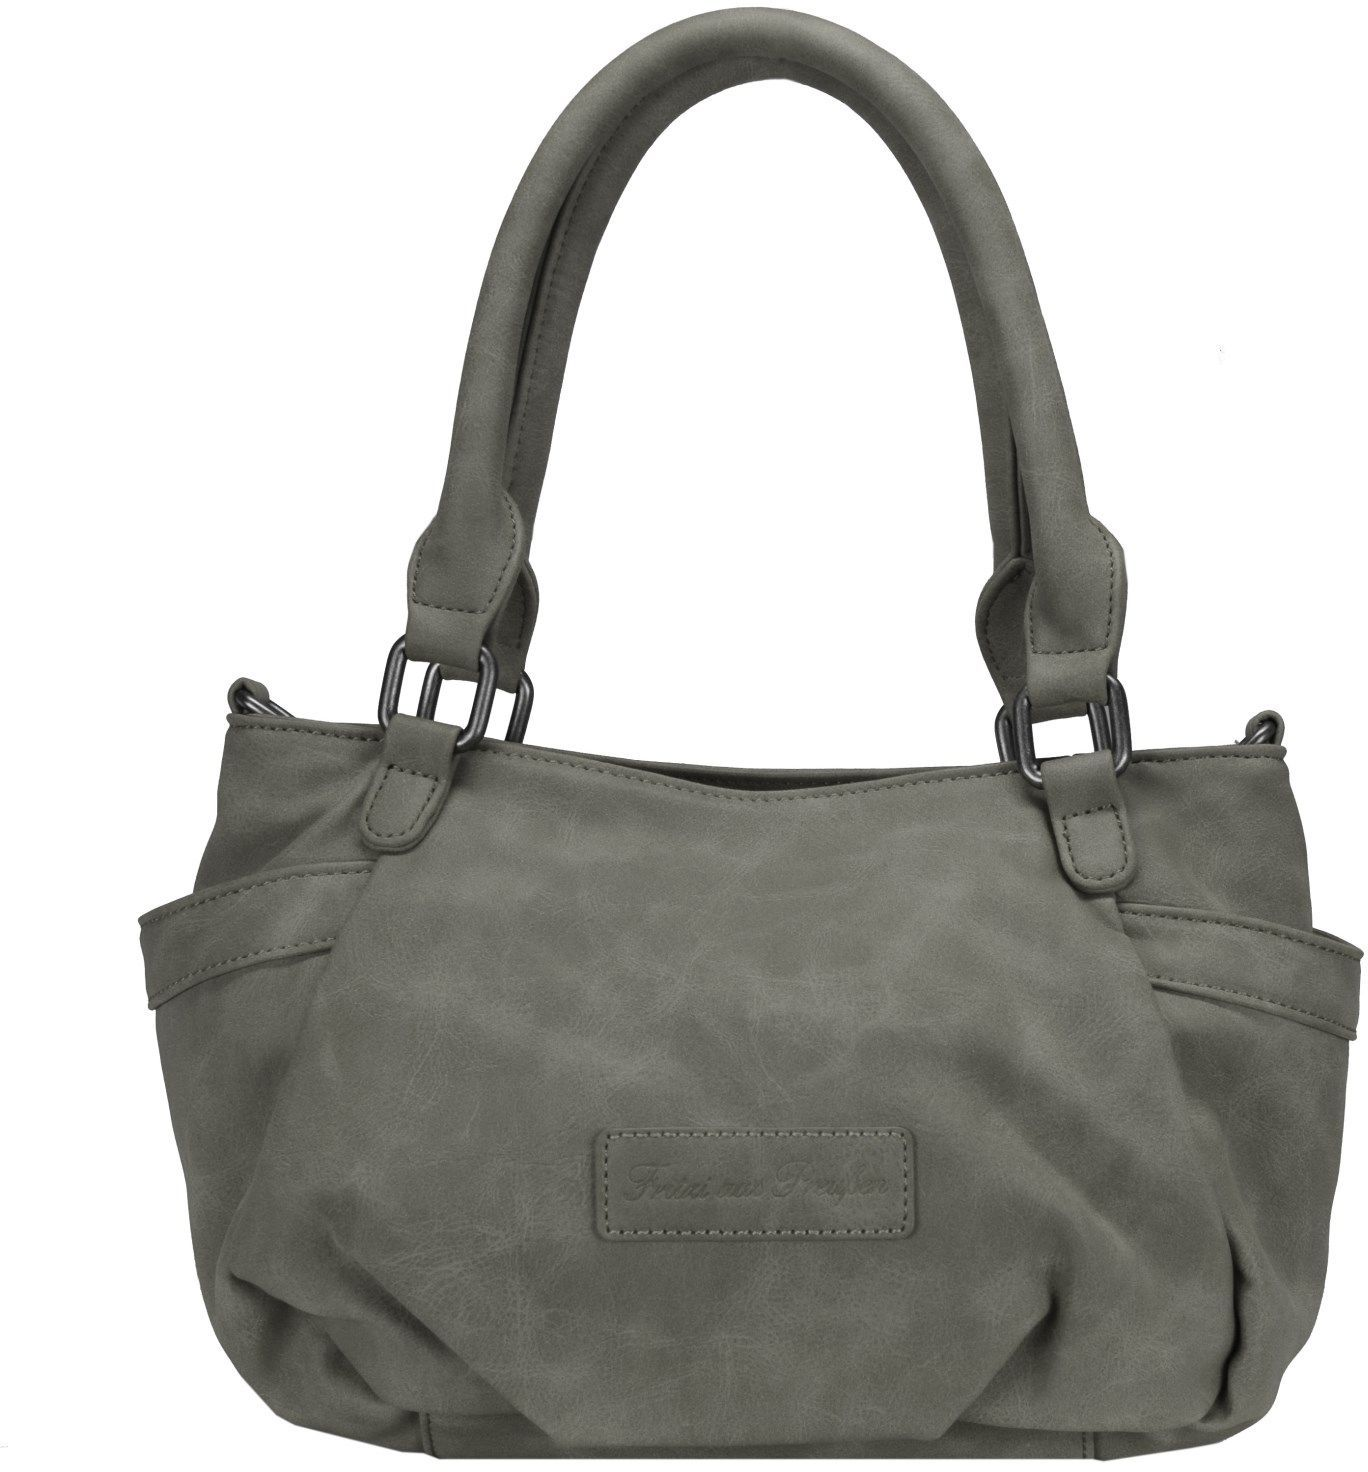 Fritzi Aus Preussen Ida New York Handtasche 34 Cm Von Fritzi Aus Preussen Bei About You Taschen Fritzi Aus Preussen Taschen Online